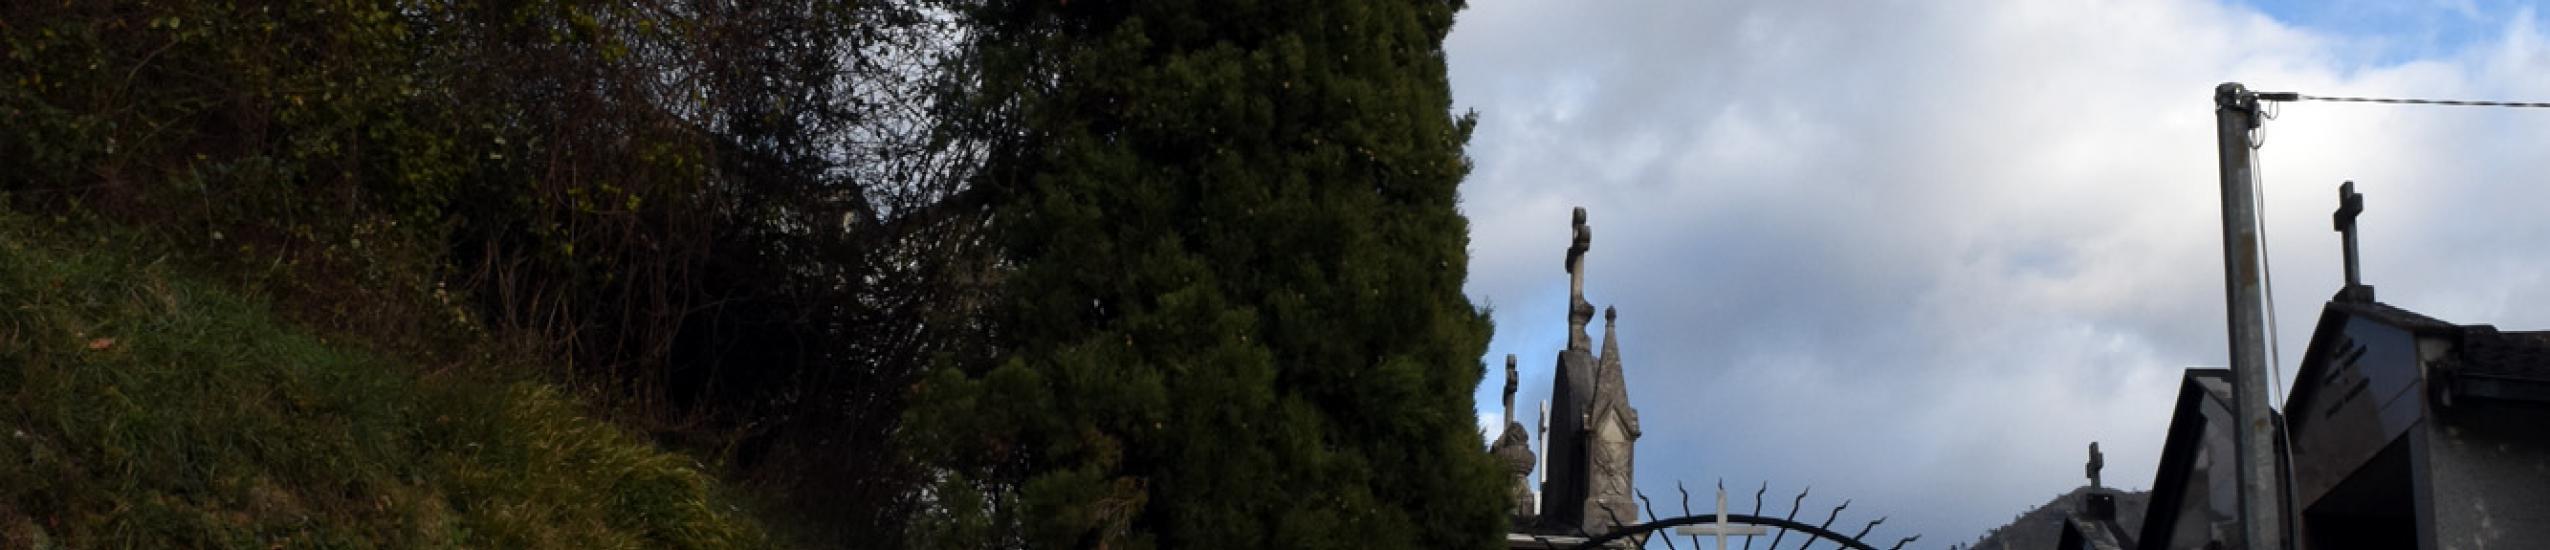 cimitero chiesanuova